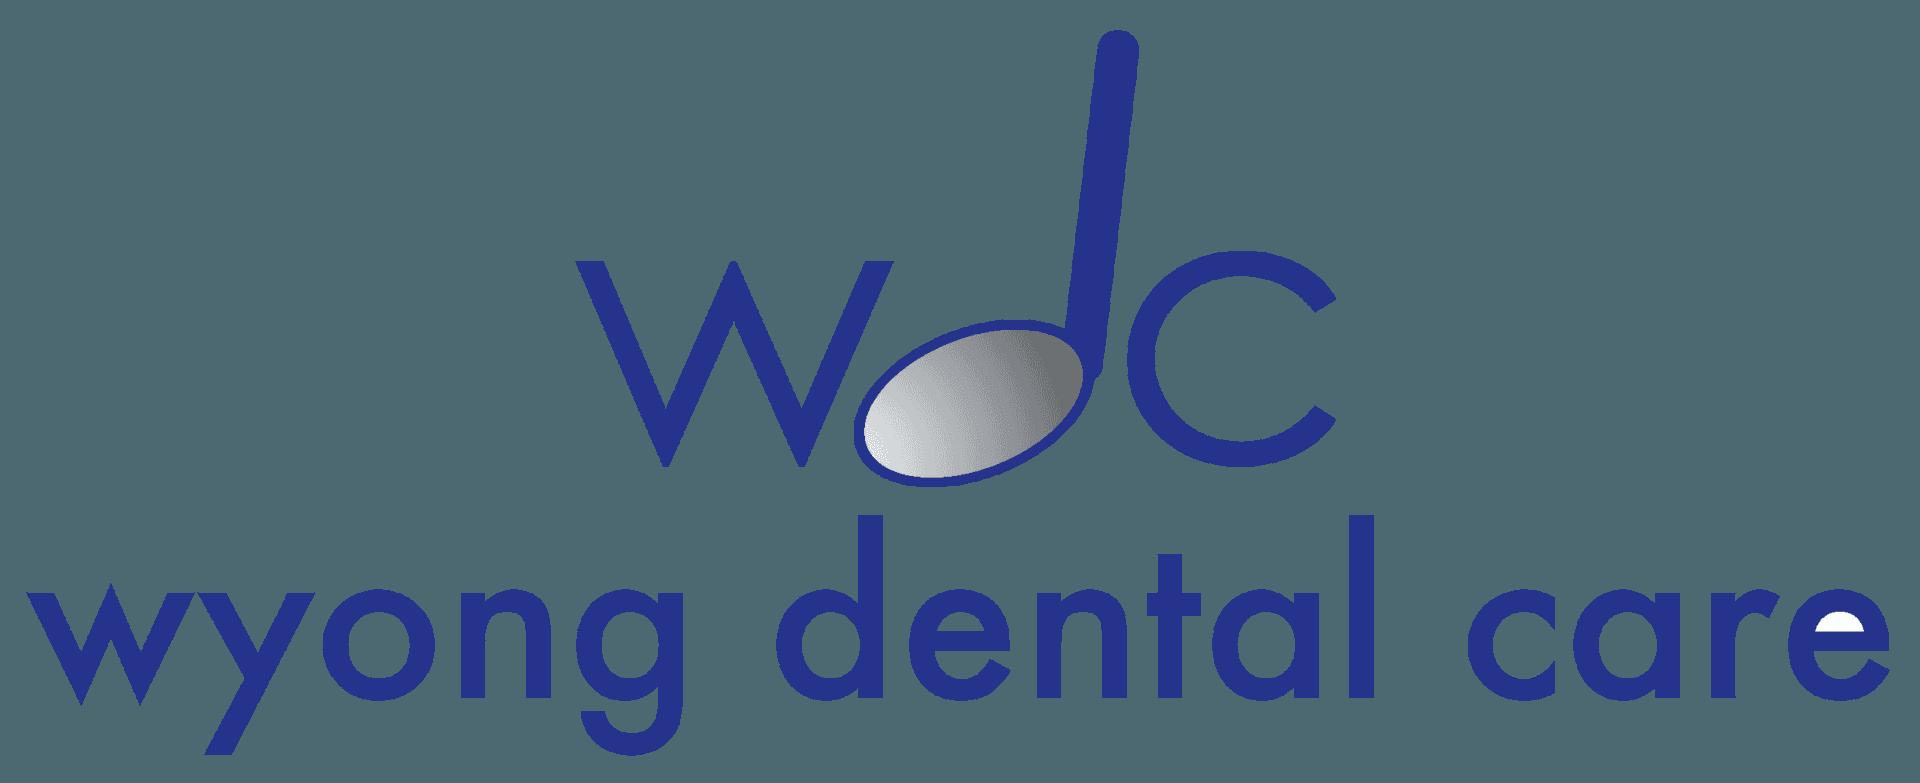 Wyong Dental Care